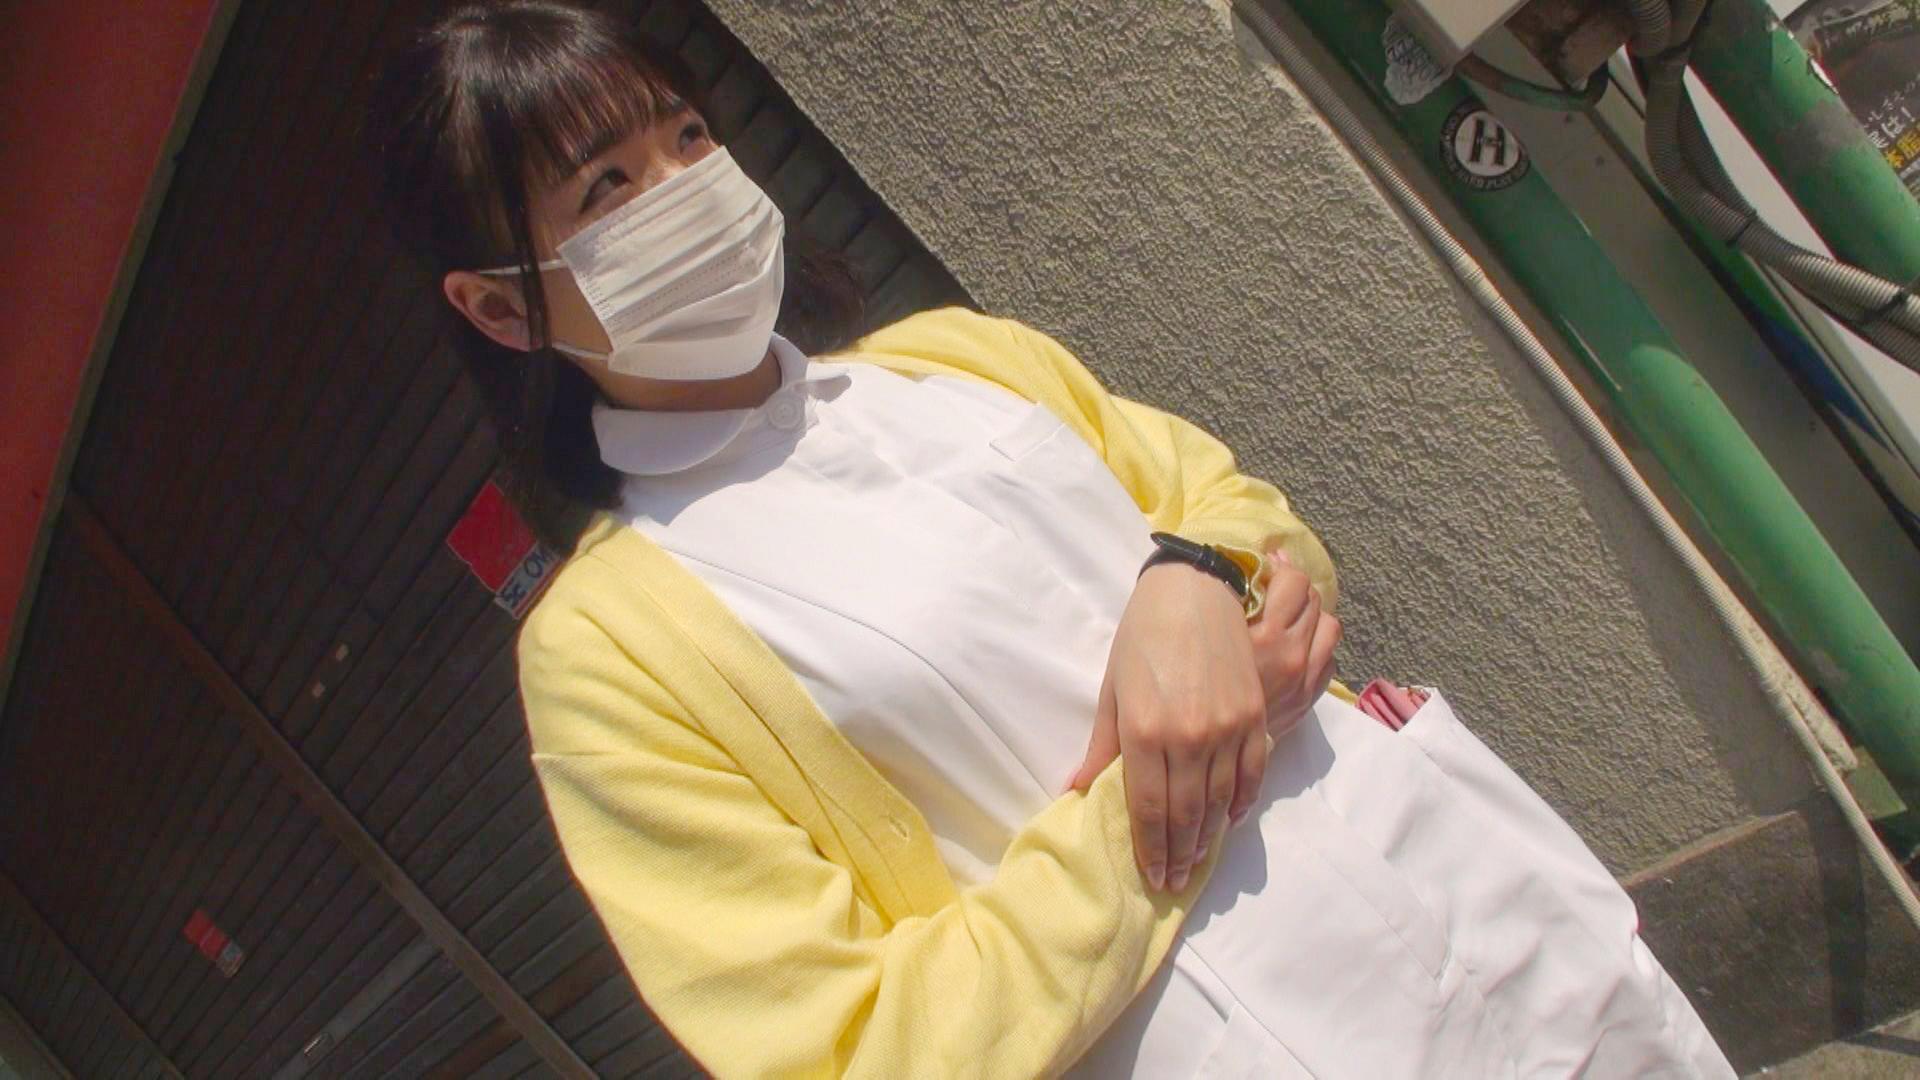 FC2 PPV 1528978 Tokyo ●● Hospital work White ● Eri ● (Genuine amateur) Gachi outflow -Limited quantity-